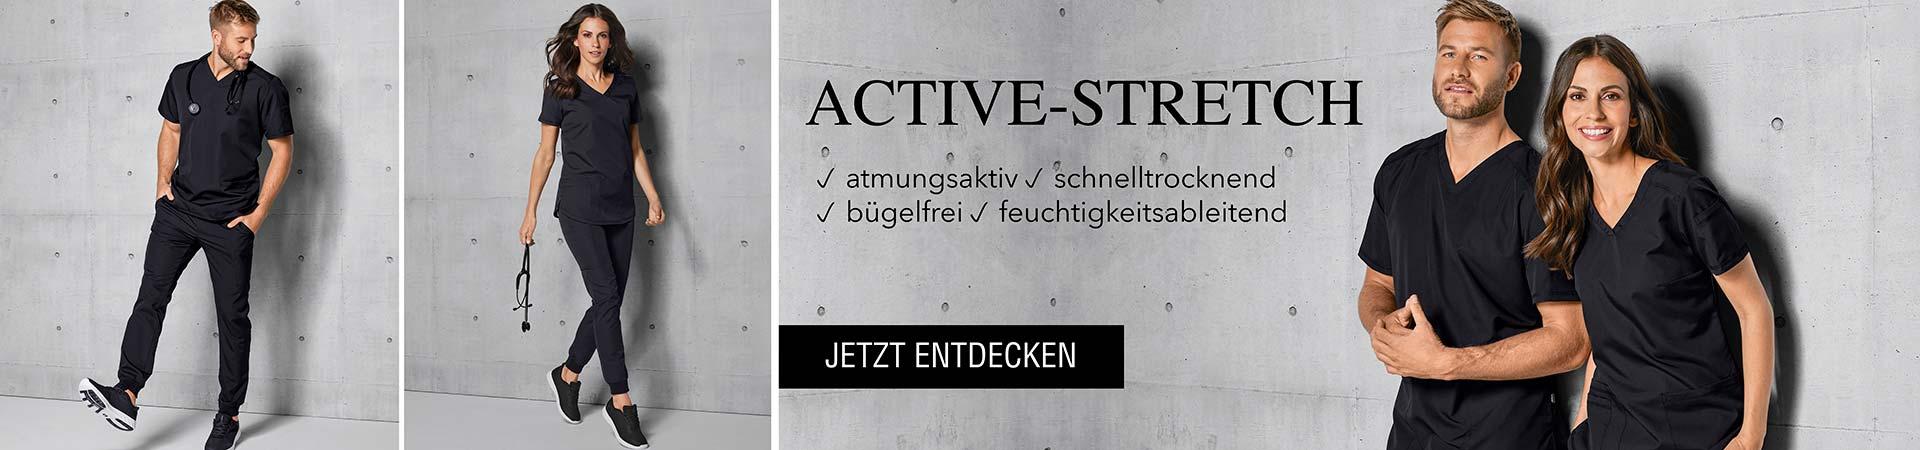 Teambekleidung Active Stretch